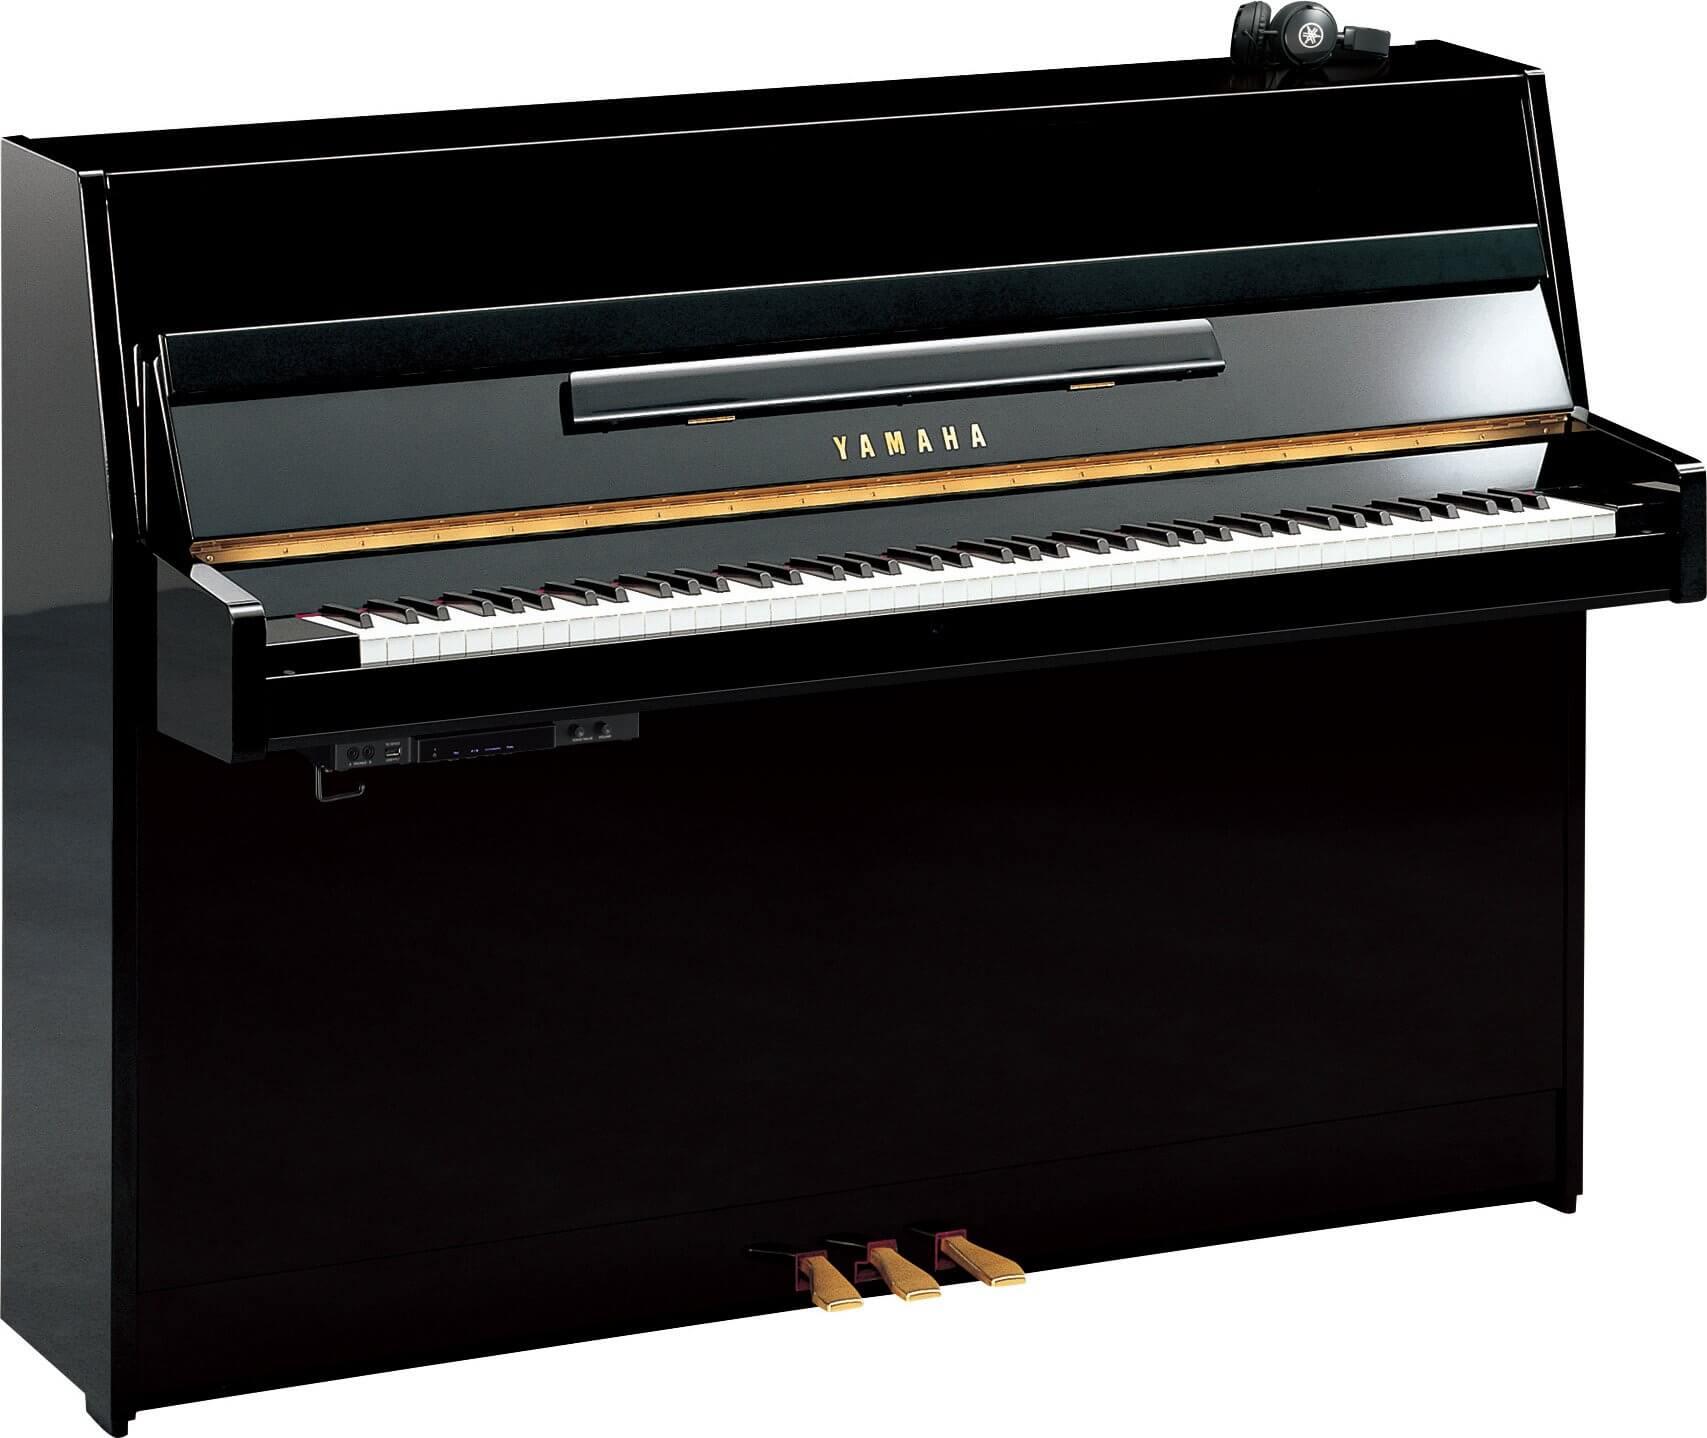 Piano Vertical Silent Yamaha B1 SC2